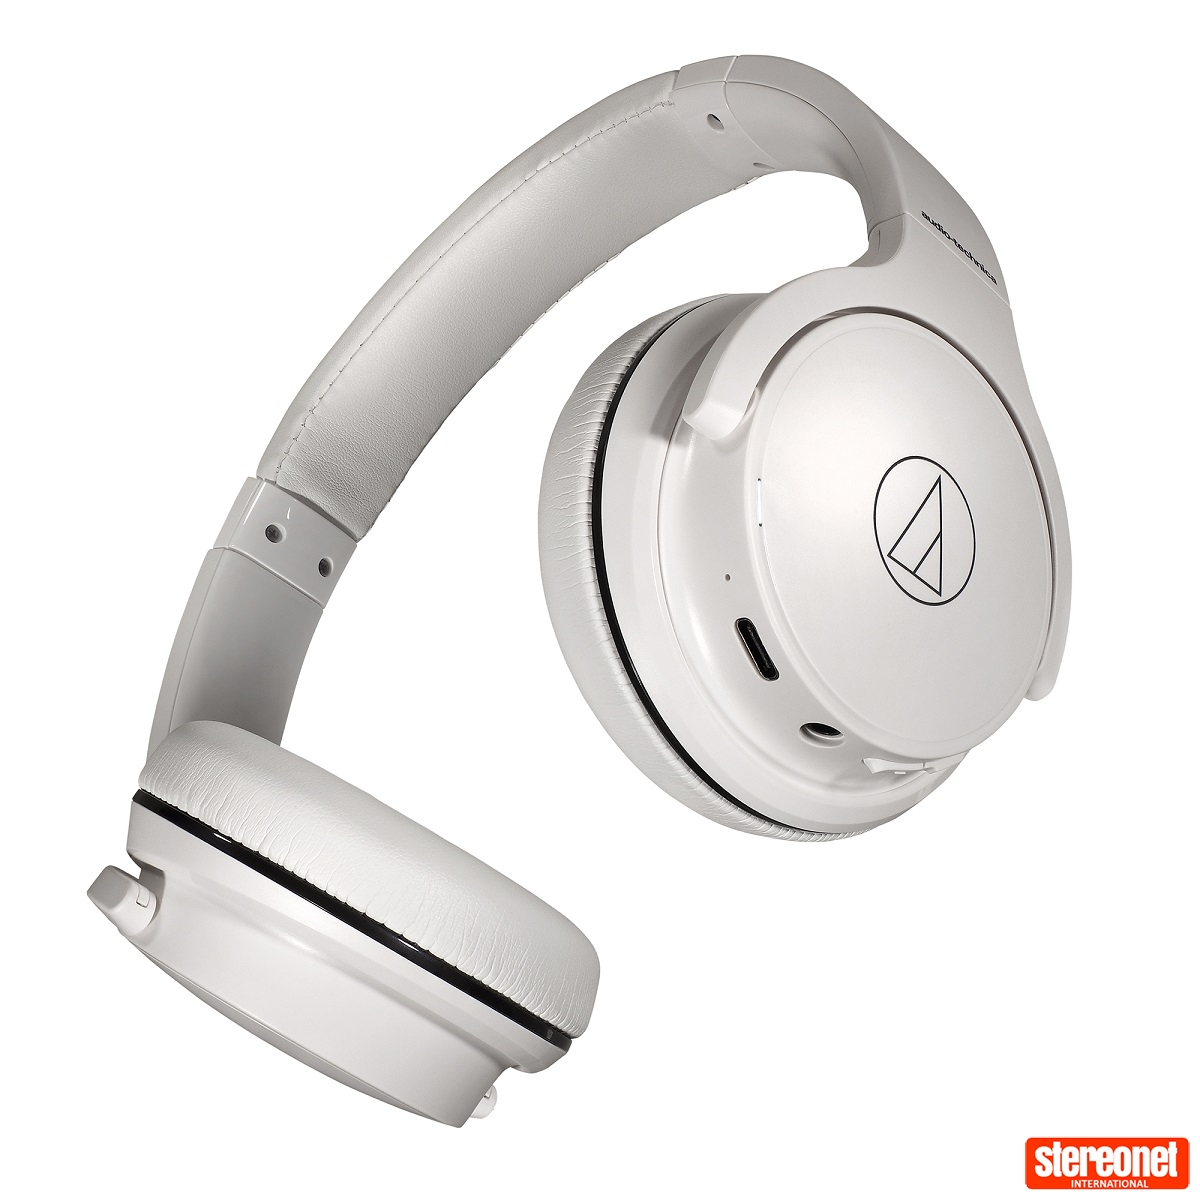 Audio-Technica ATH-S220BT headphones